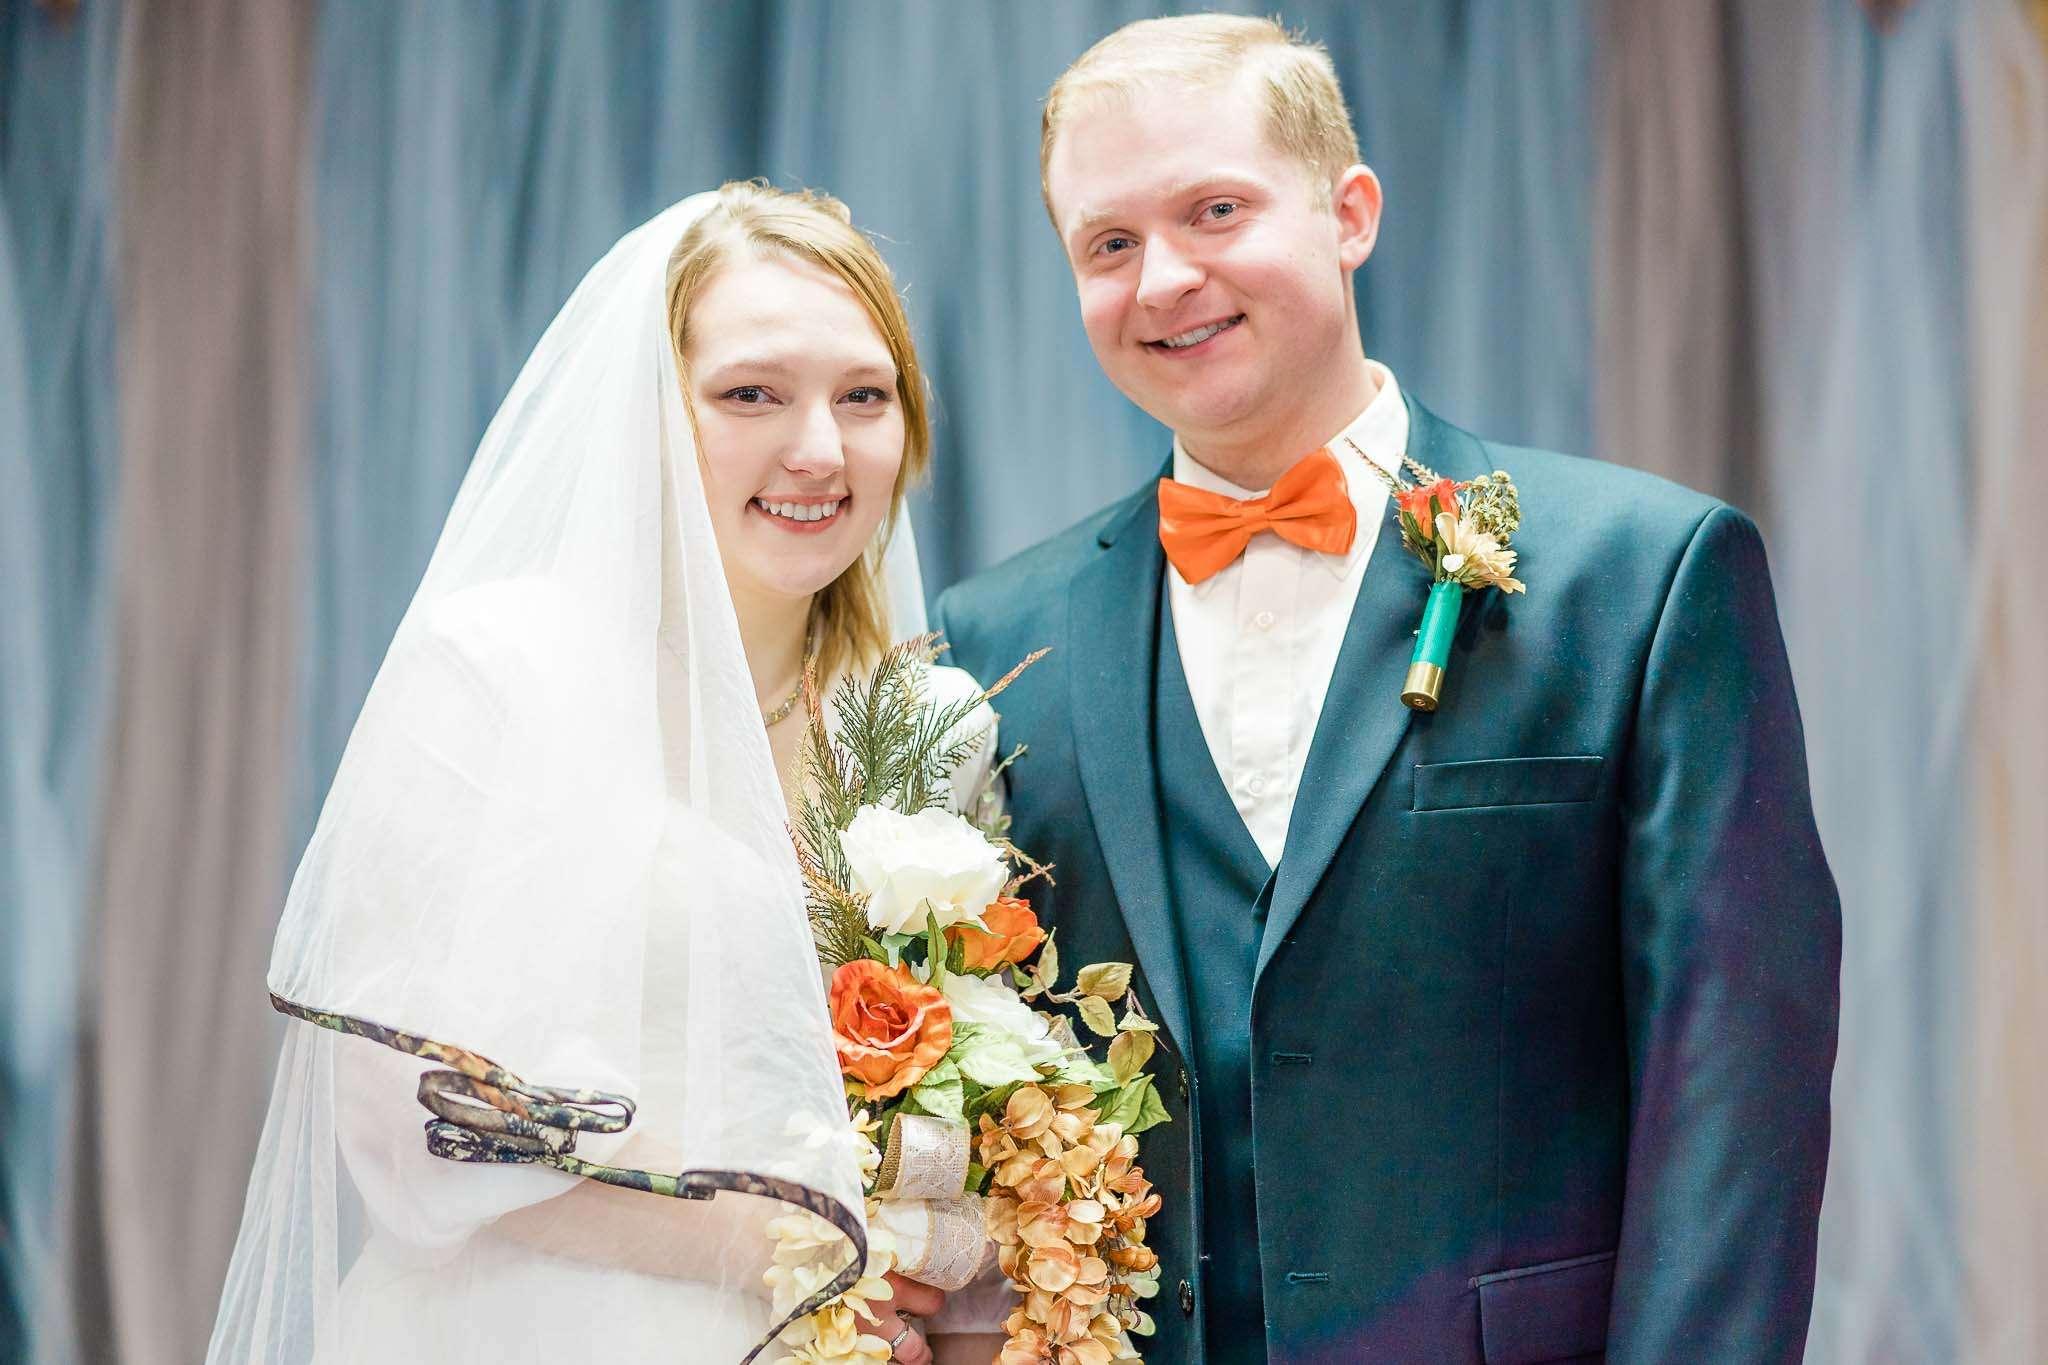 Island Ford Baptist Church - Madisonville, KY Wedding Photography - Anna + Caleb-6